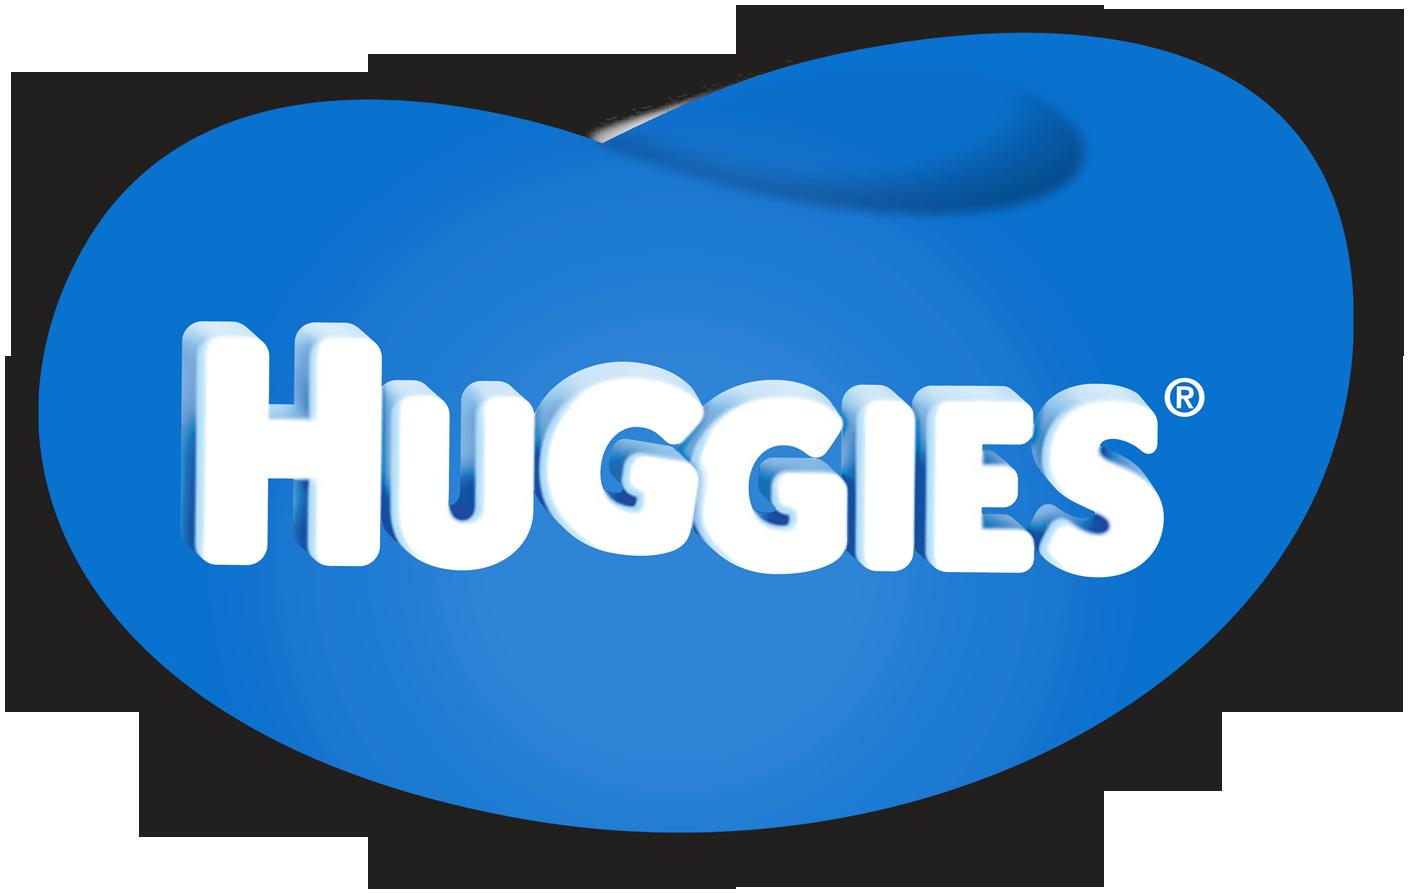 huggies-60ebd46634d42.png